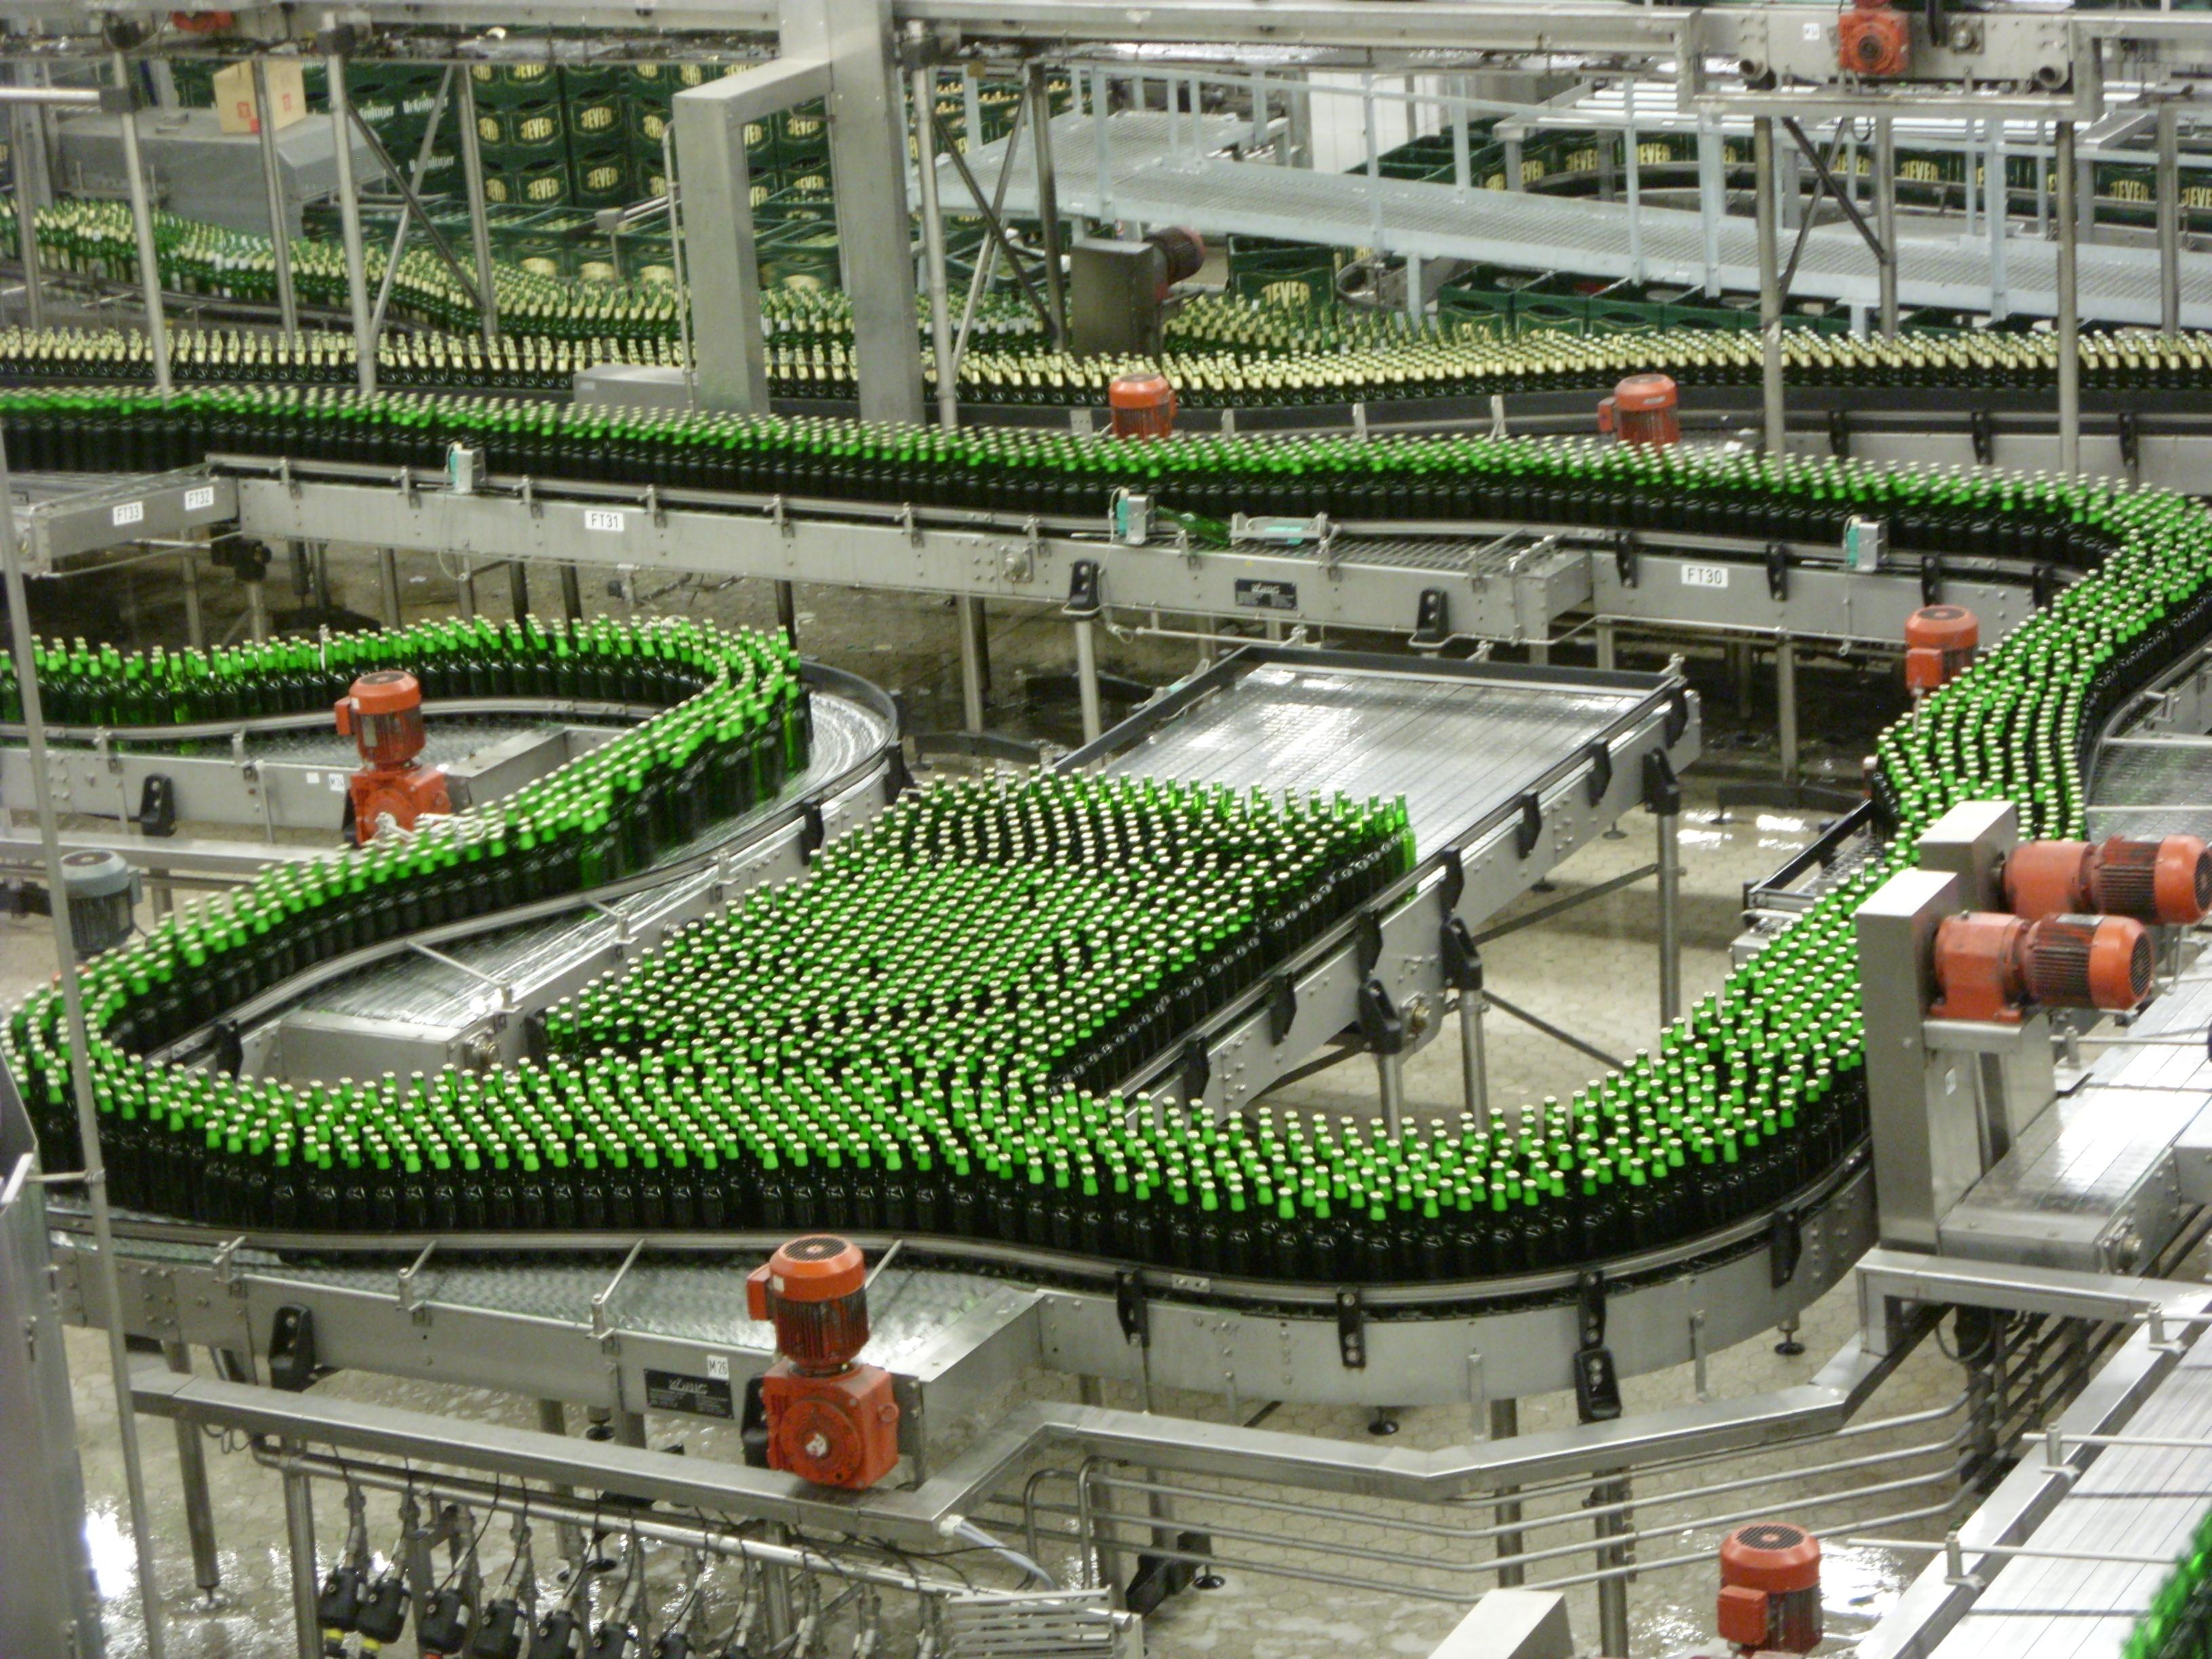 Conveyor belt brewery bottles